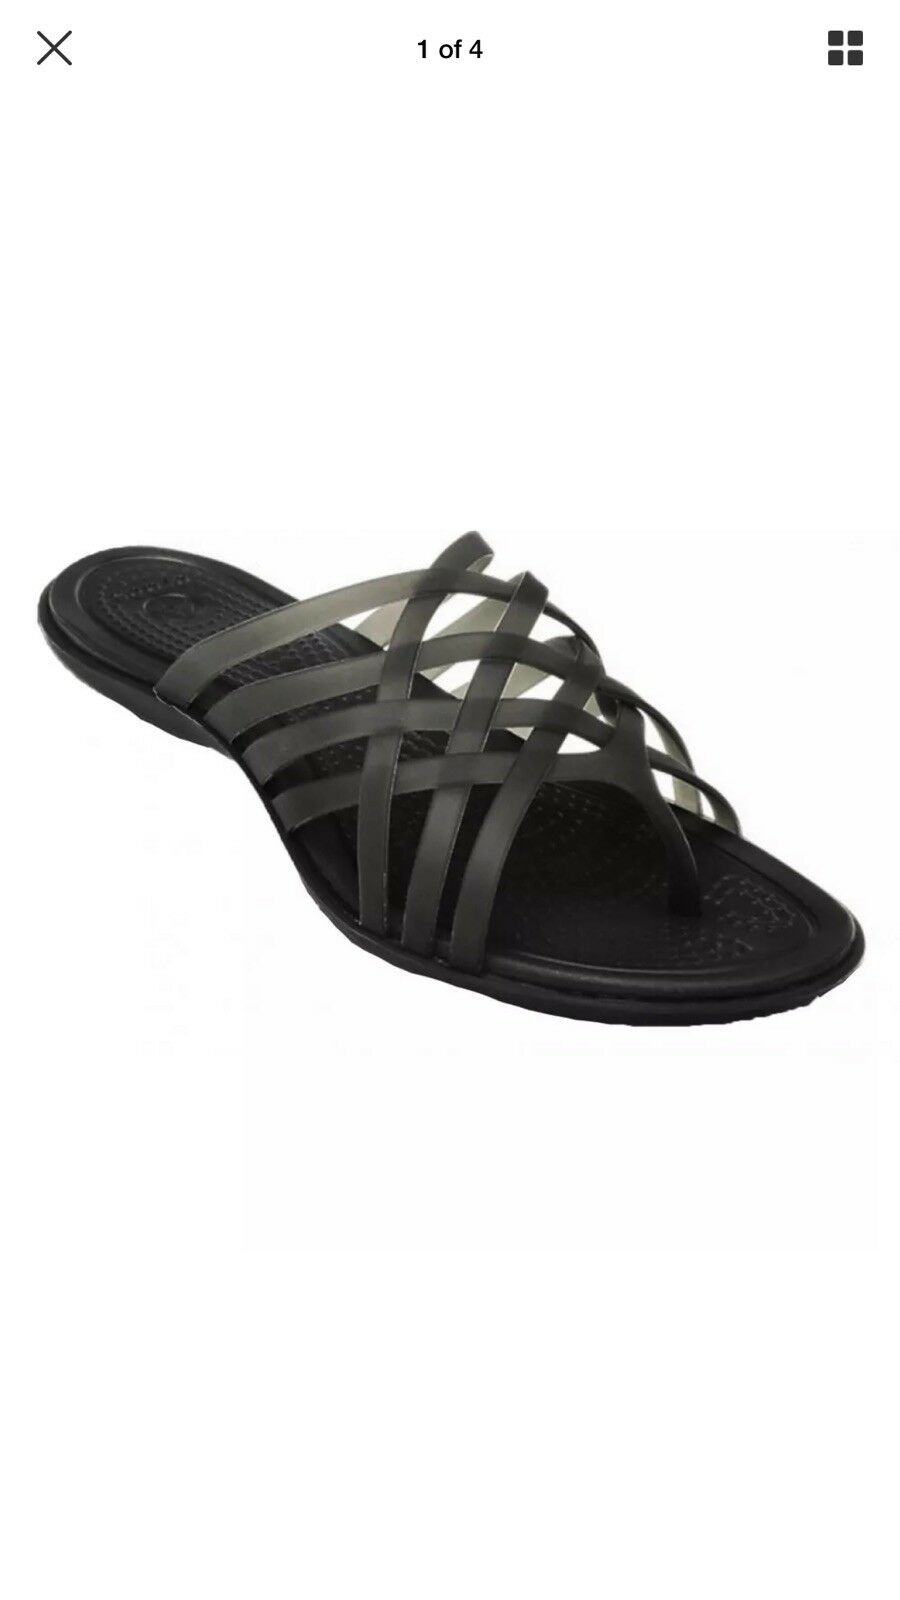 Crocs Huarache Flip Flops Black Size 4